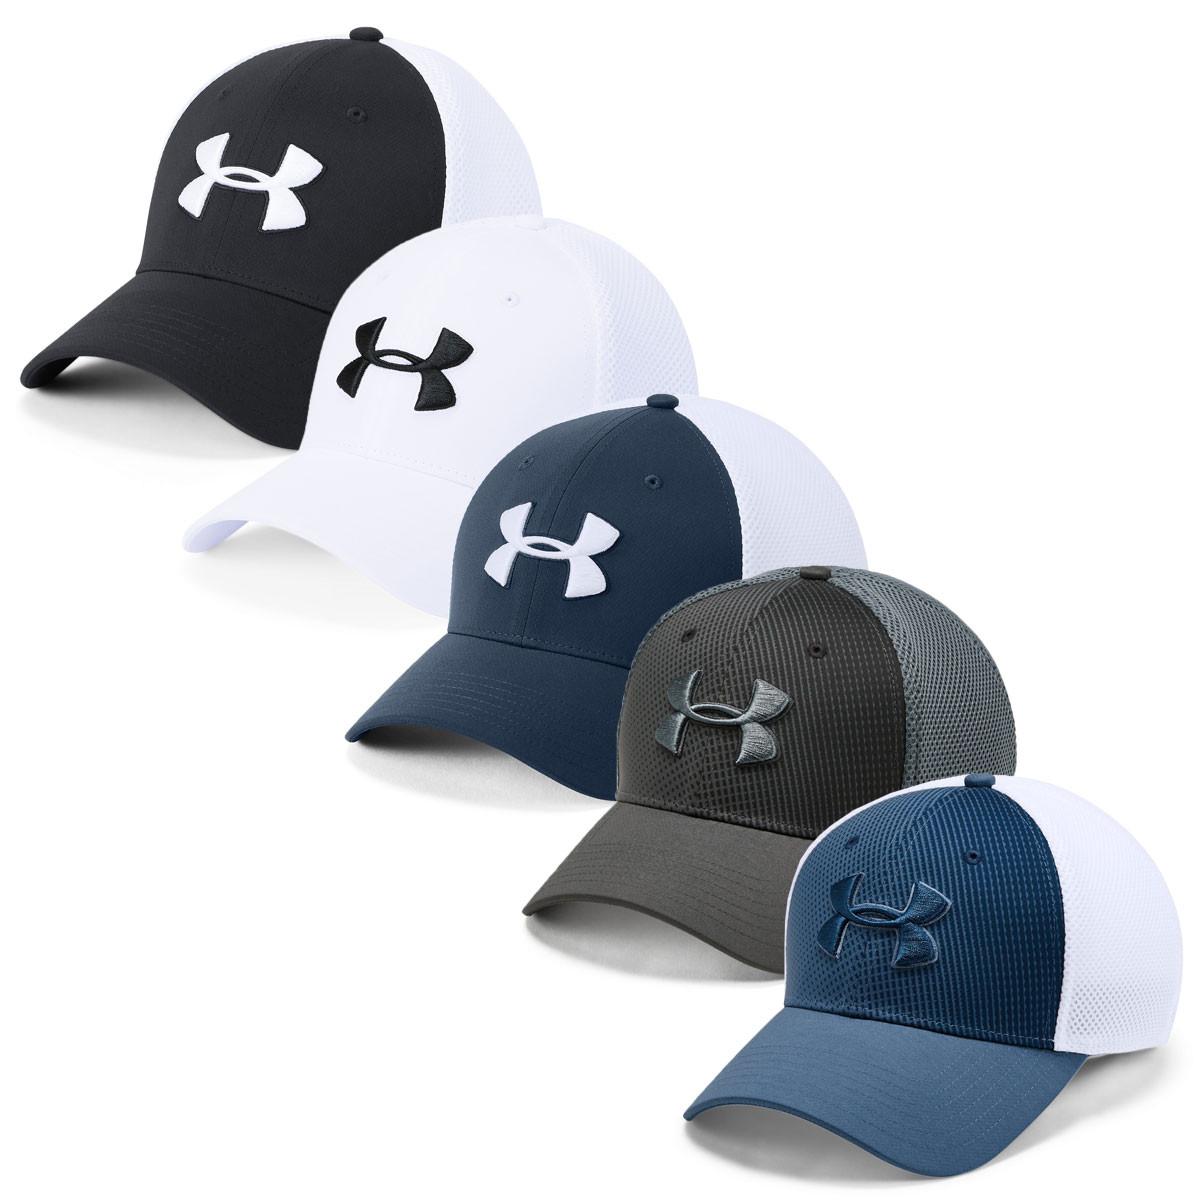 Under Armour Mens 2019 TB Classic Mesh Cap - Golf Headwear - Men - Golf e13adb90ef51